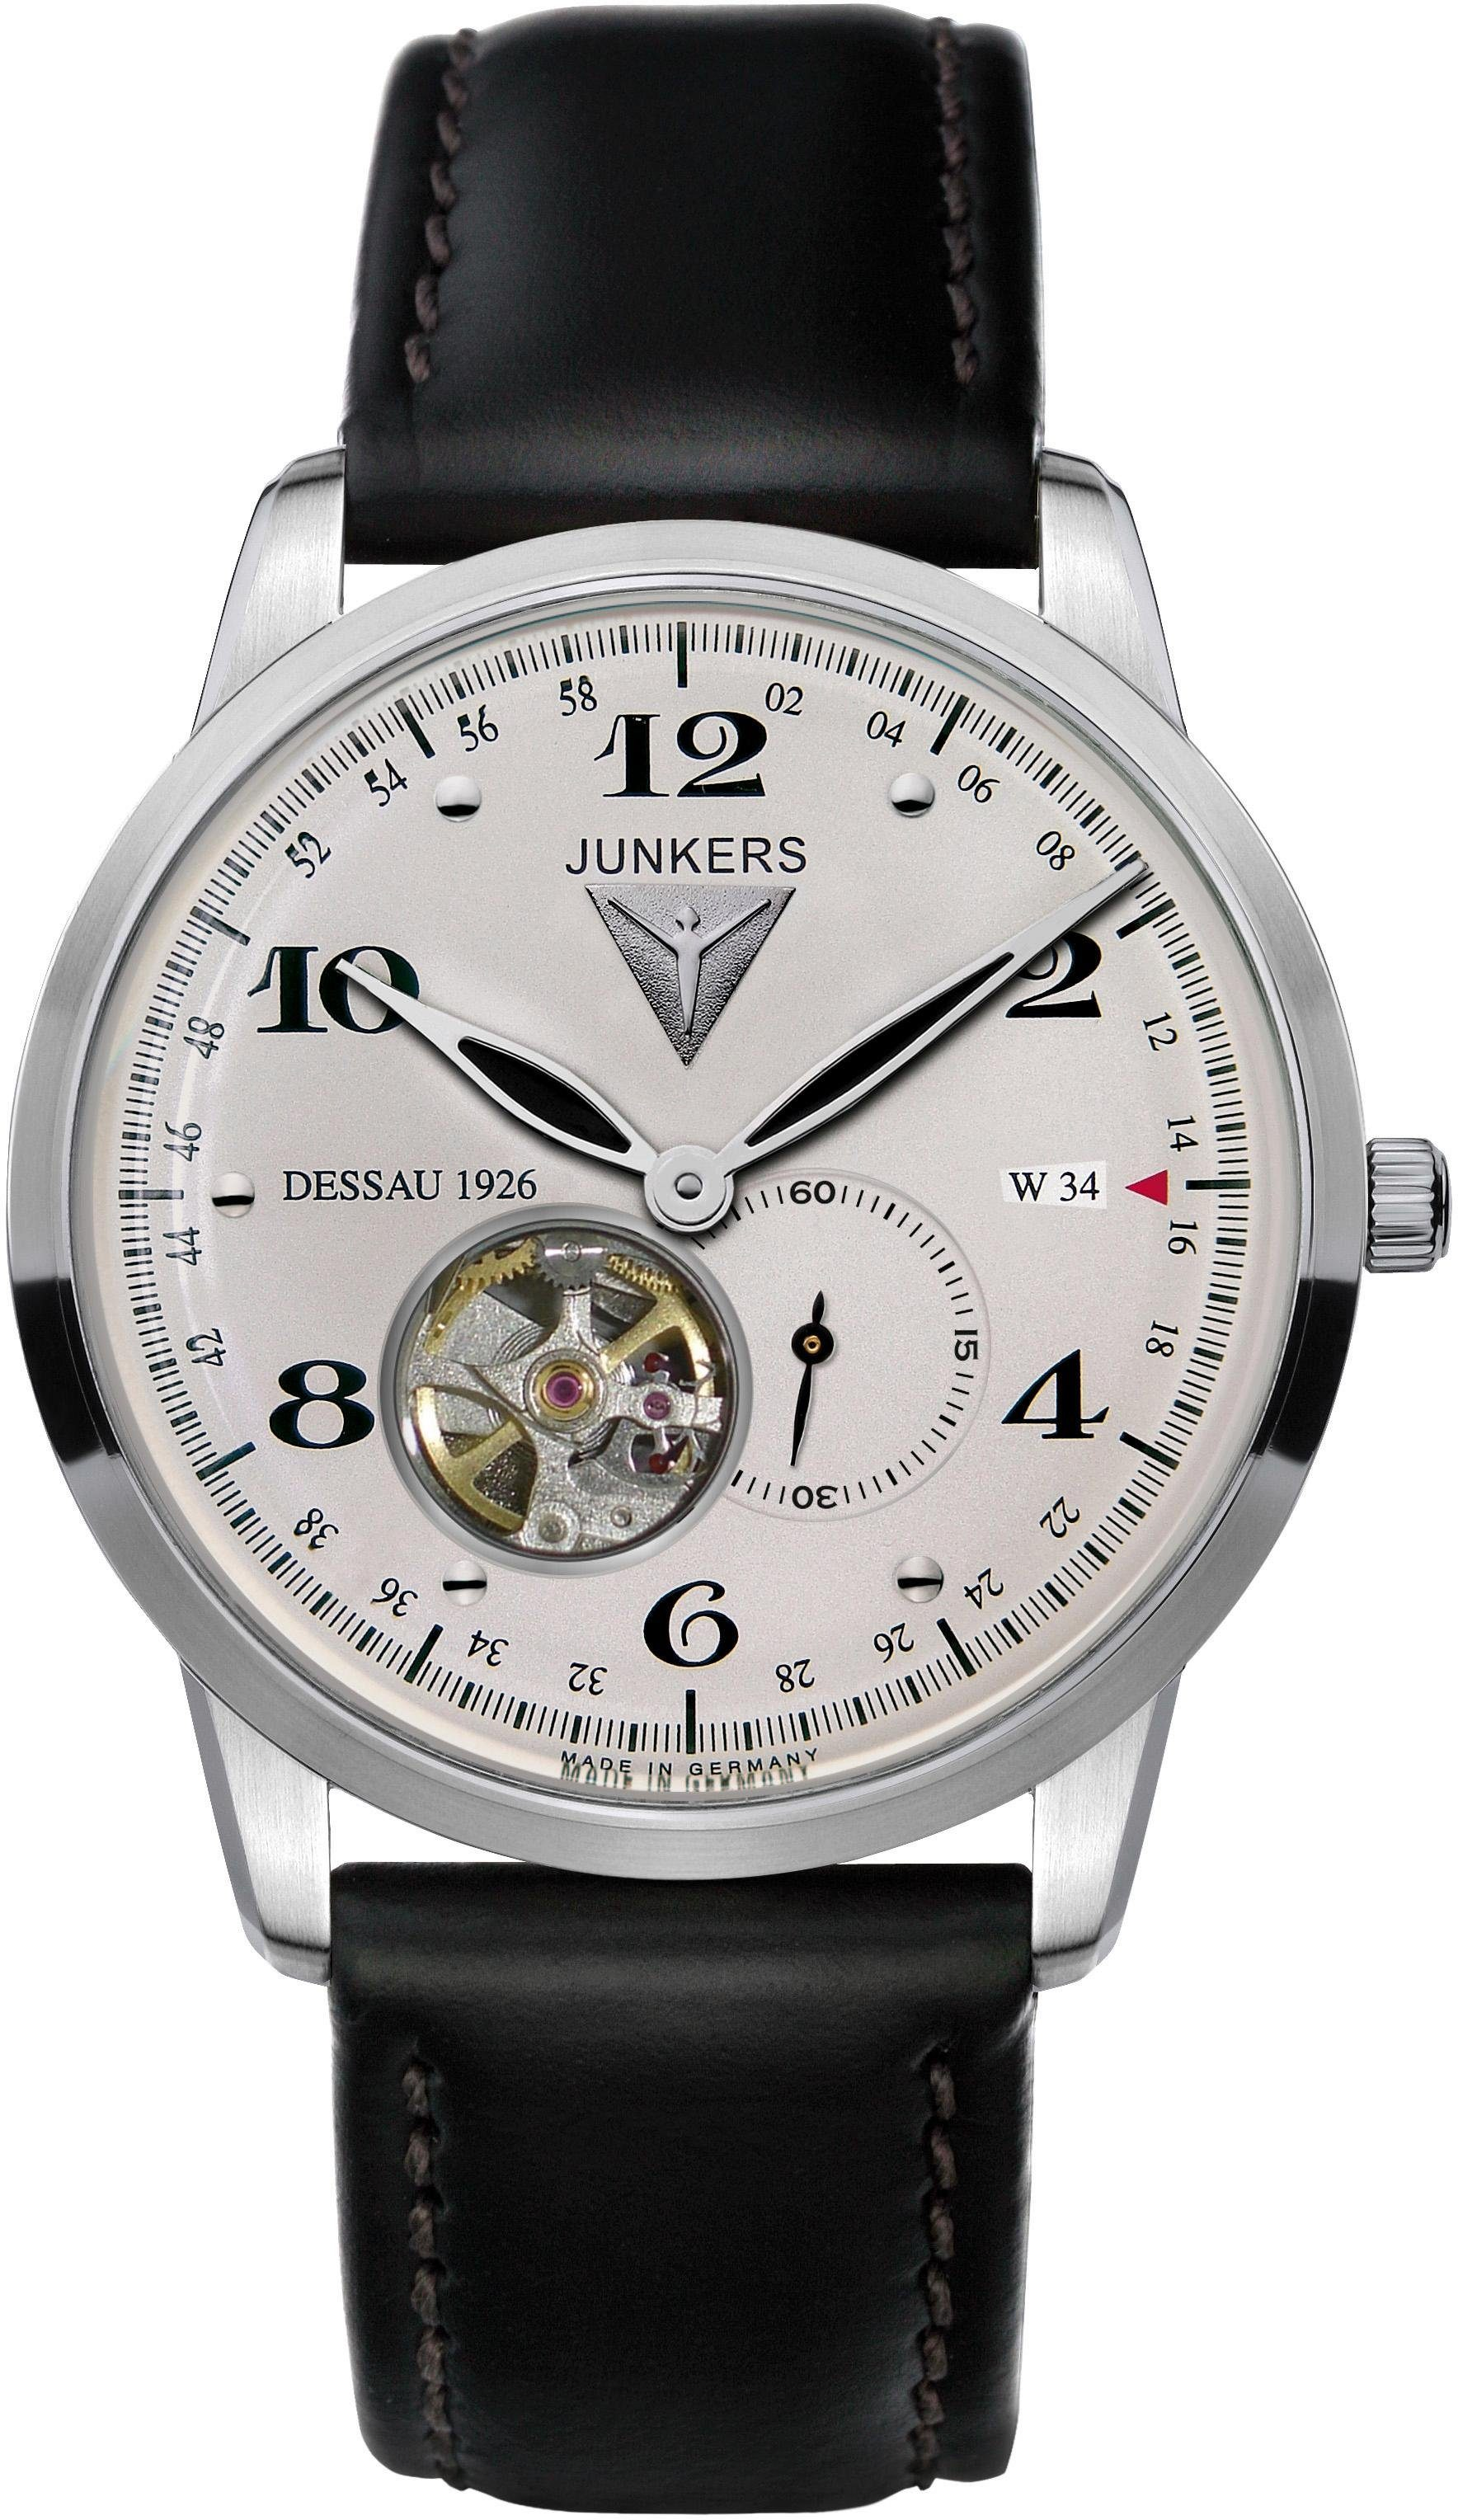 Junkers-Uhren Automatikuhr »Junkers Dessau 1926 Flatline, 6360-4« made in Germany